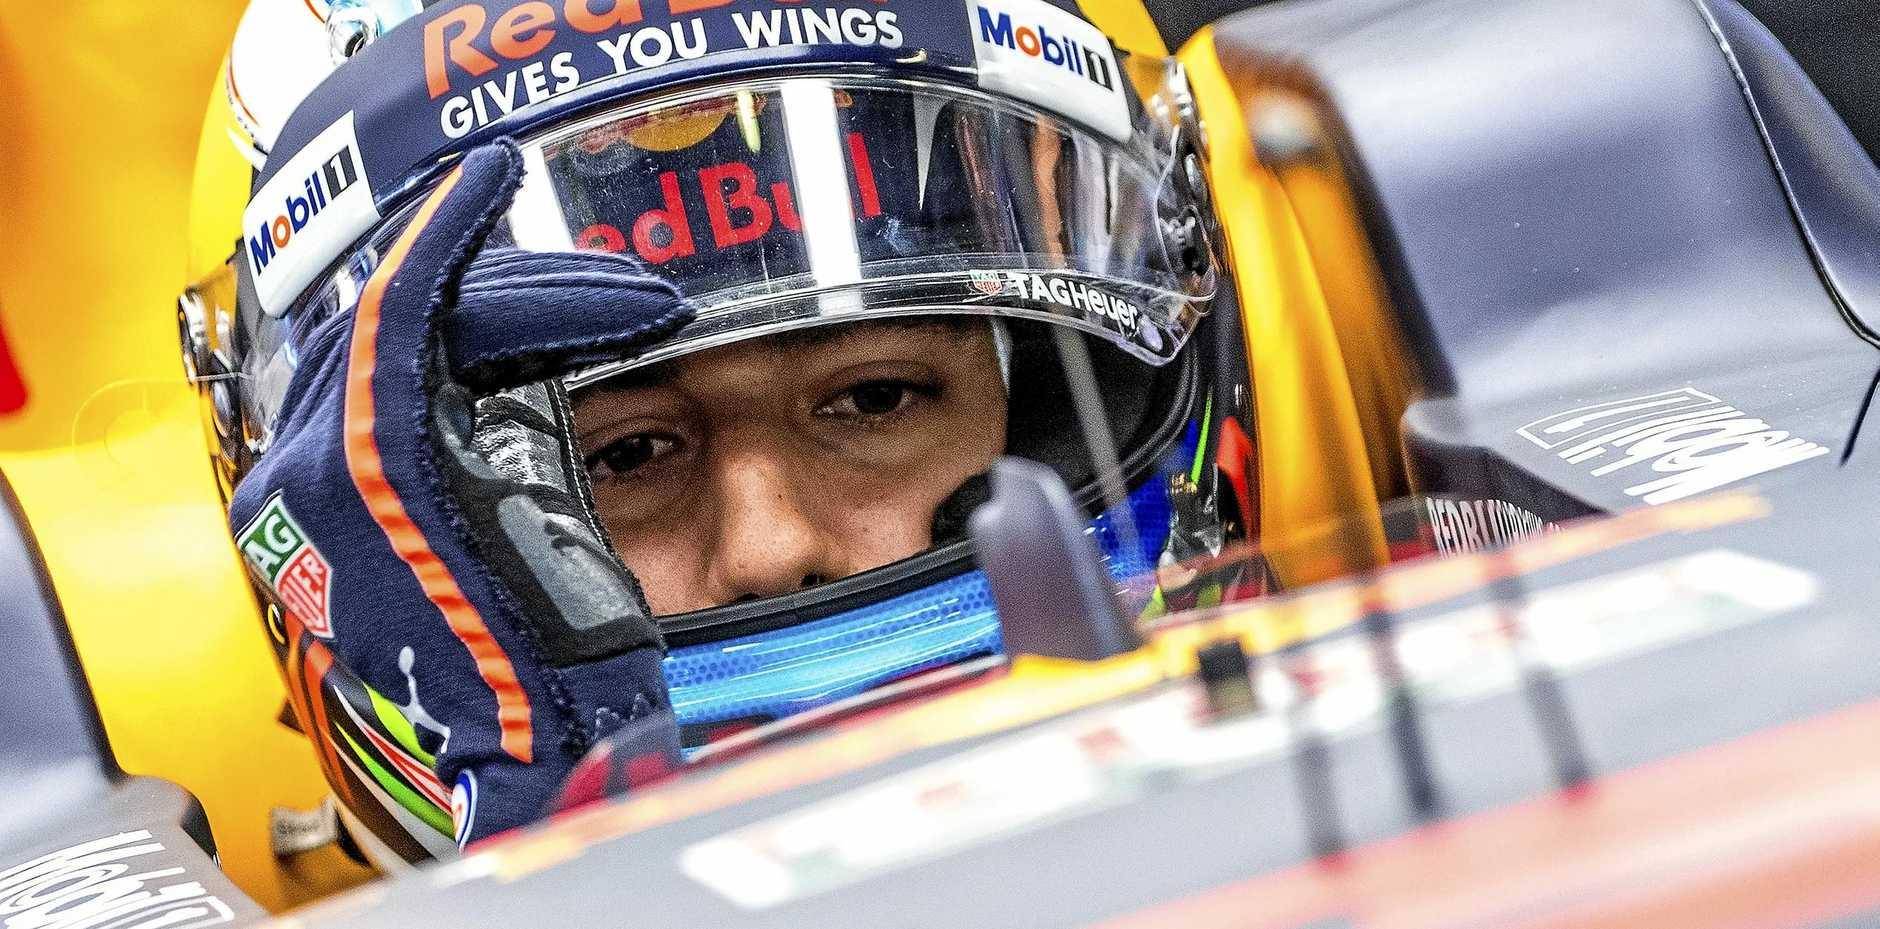 Daniel Ricciardo behind the wheel of his Red Bull at Monza.